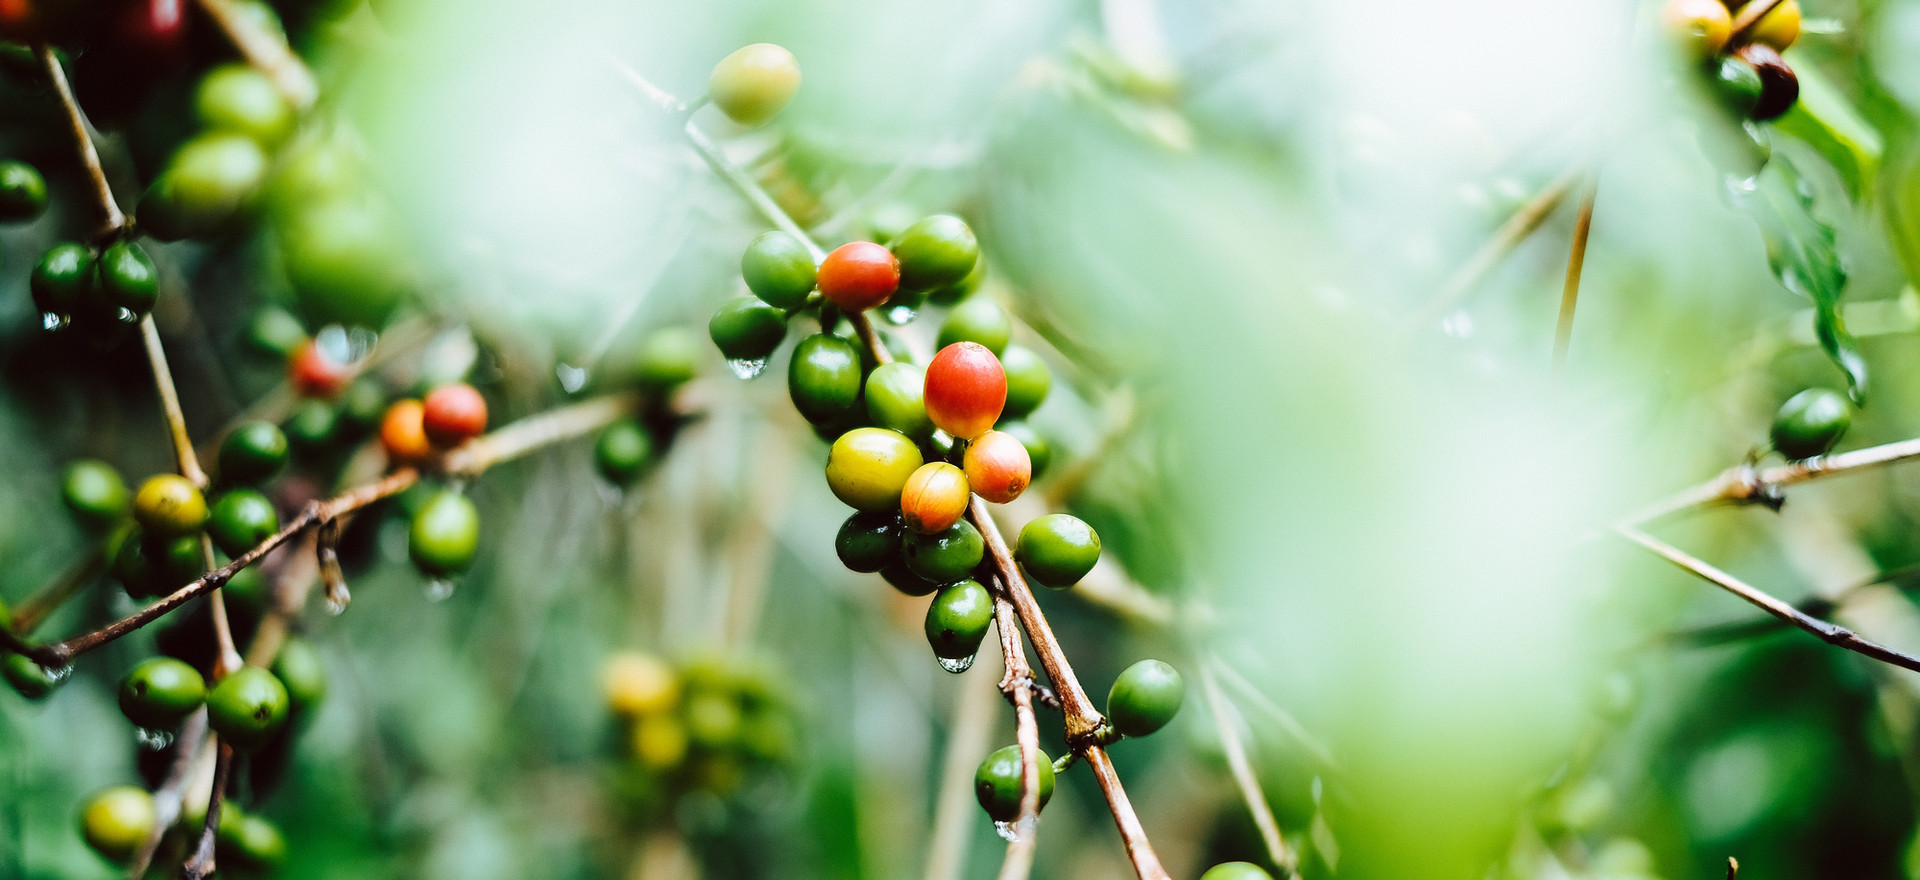 Brazilian Green Coffee Beans